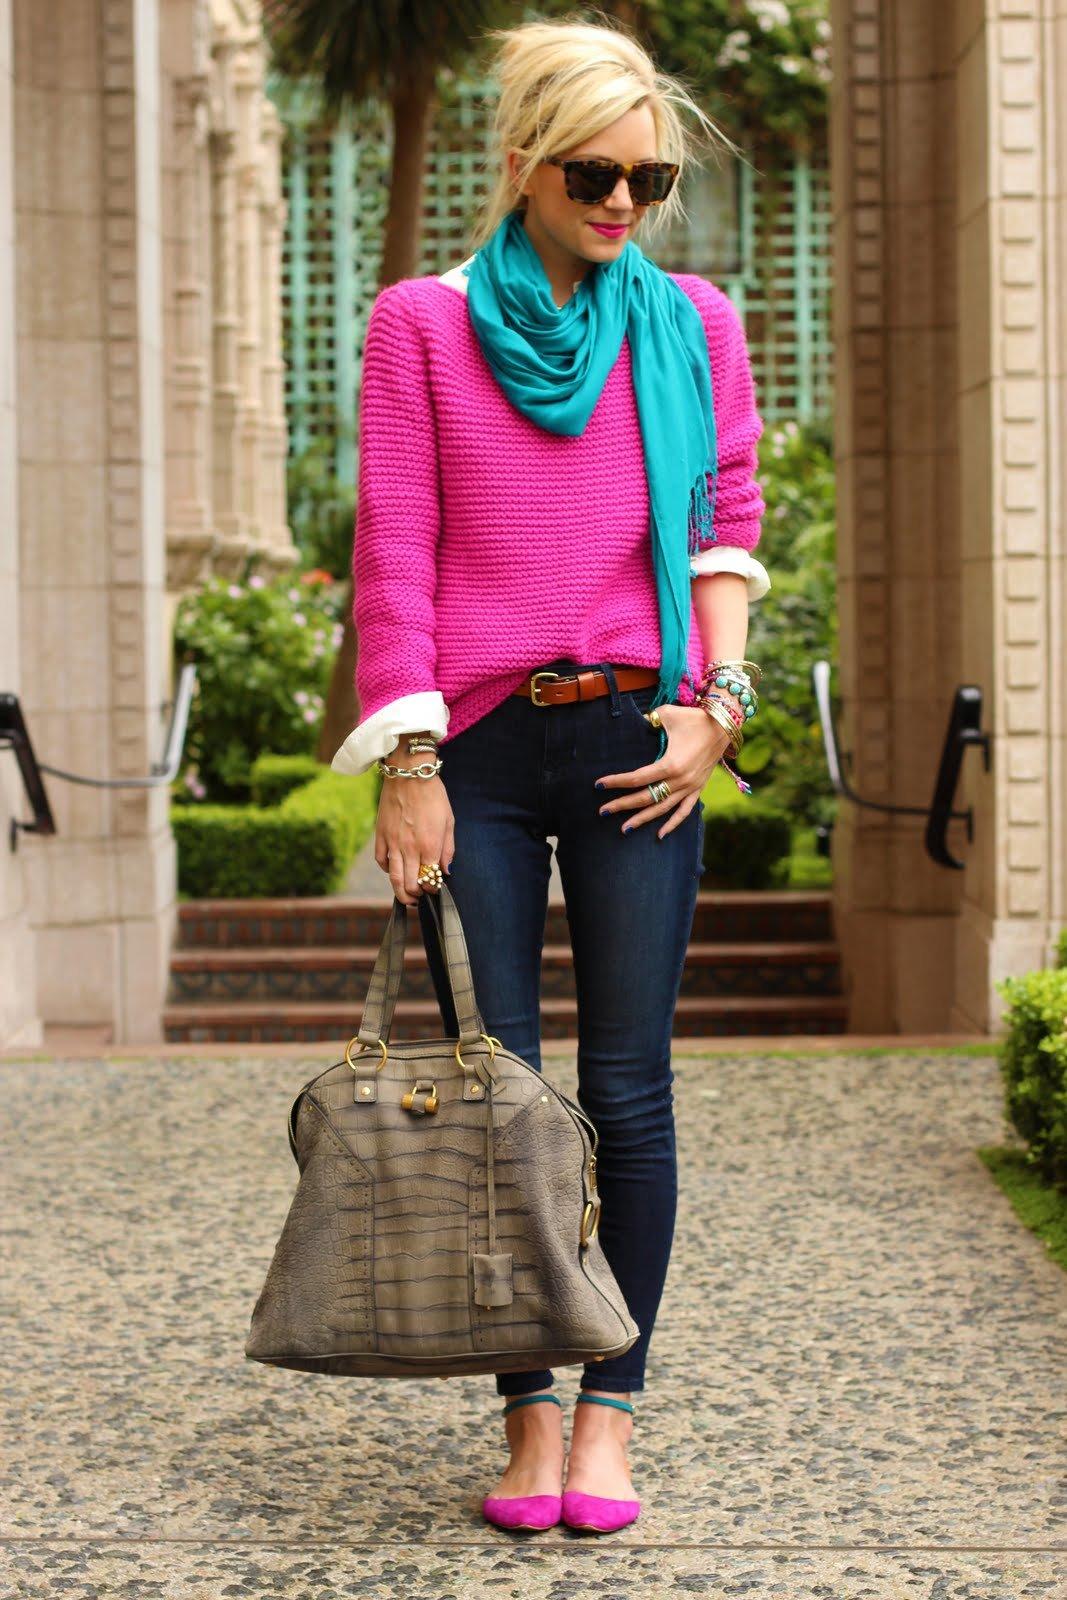 Cohens fashion optical astoria 81